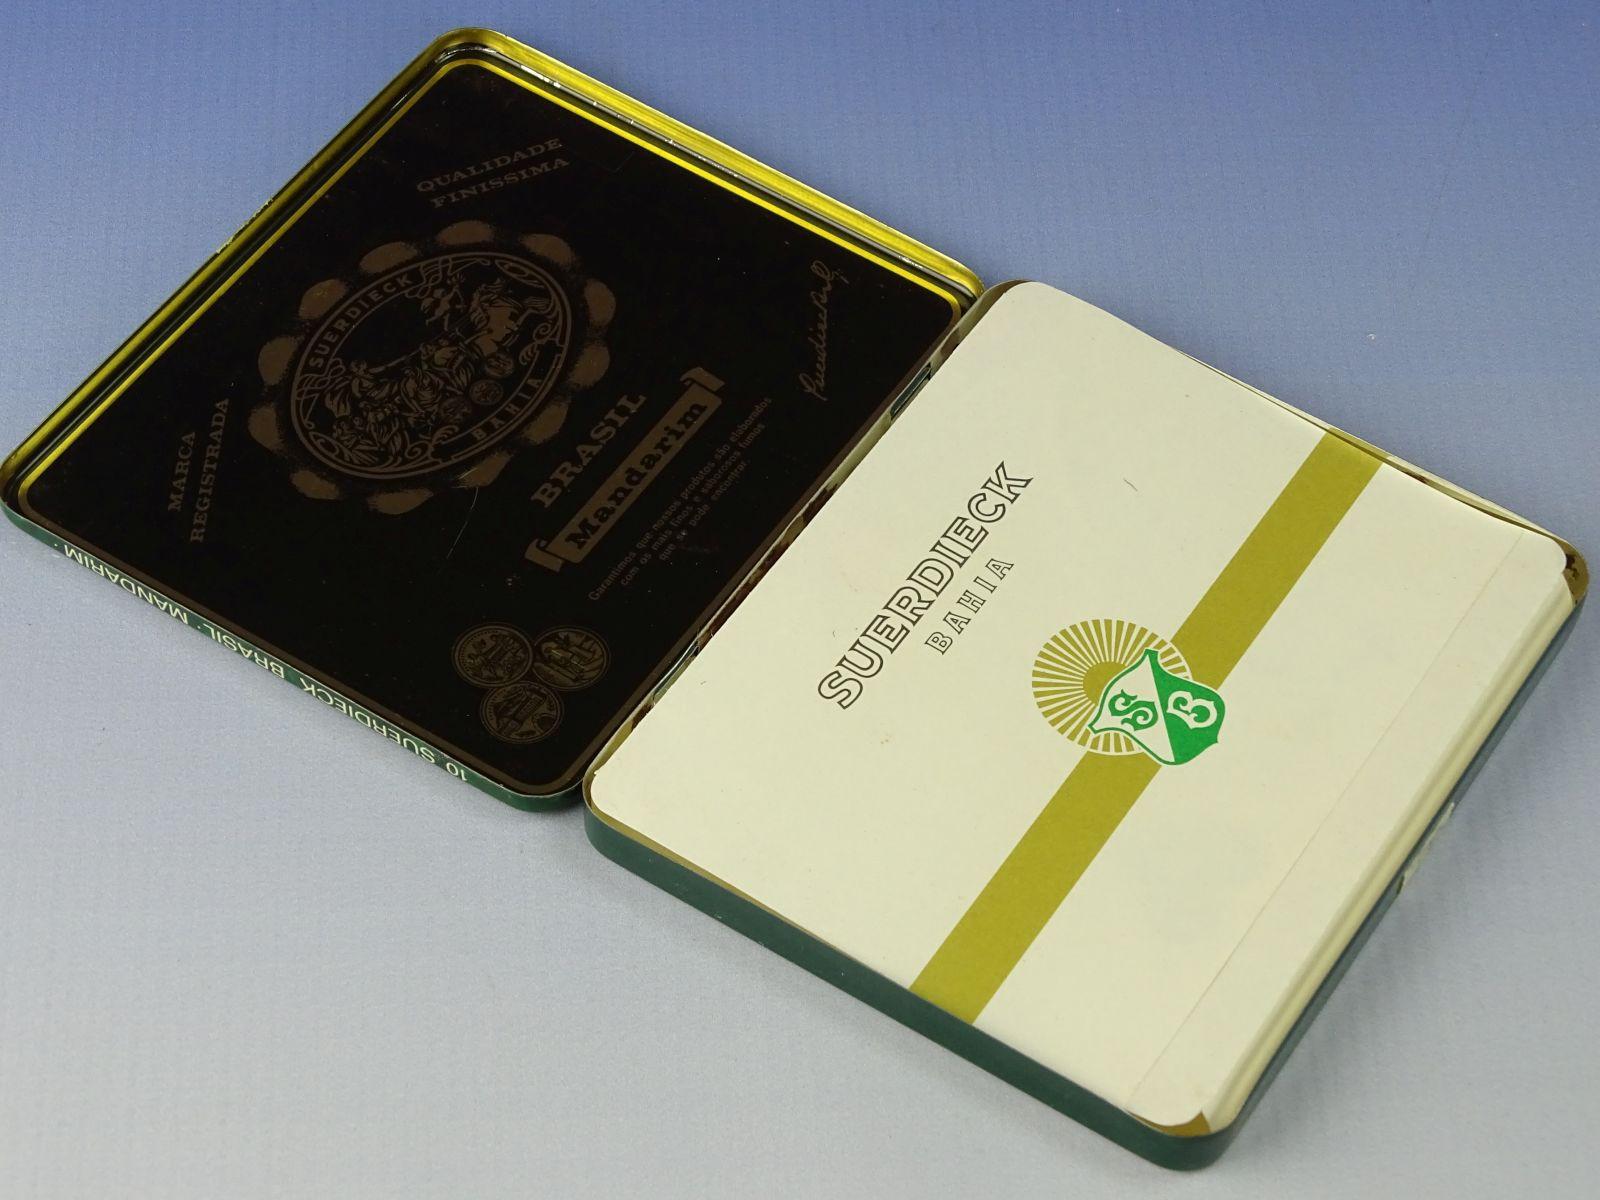 DSC07719.JPG (1600�1200)